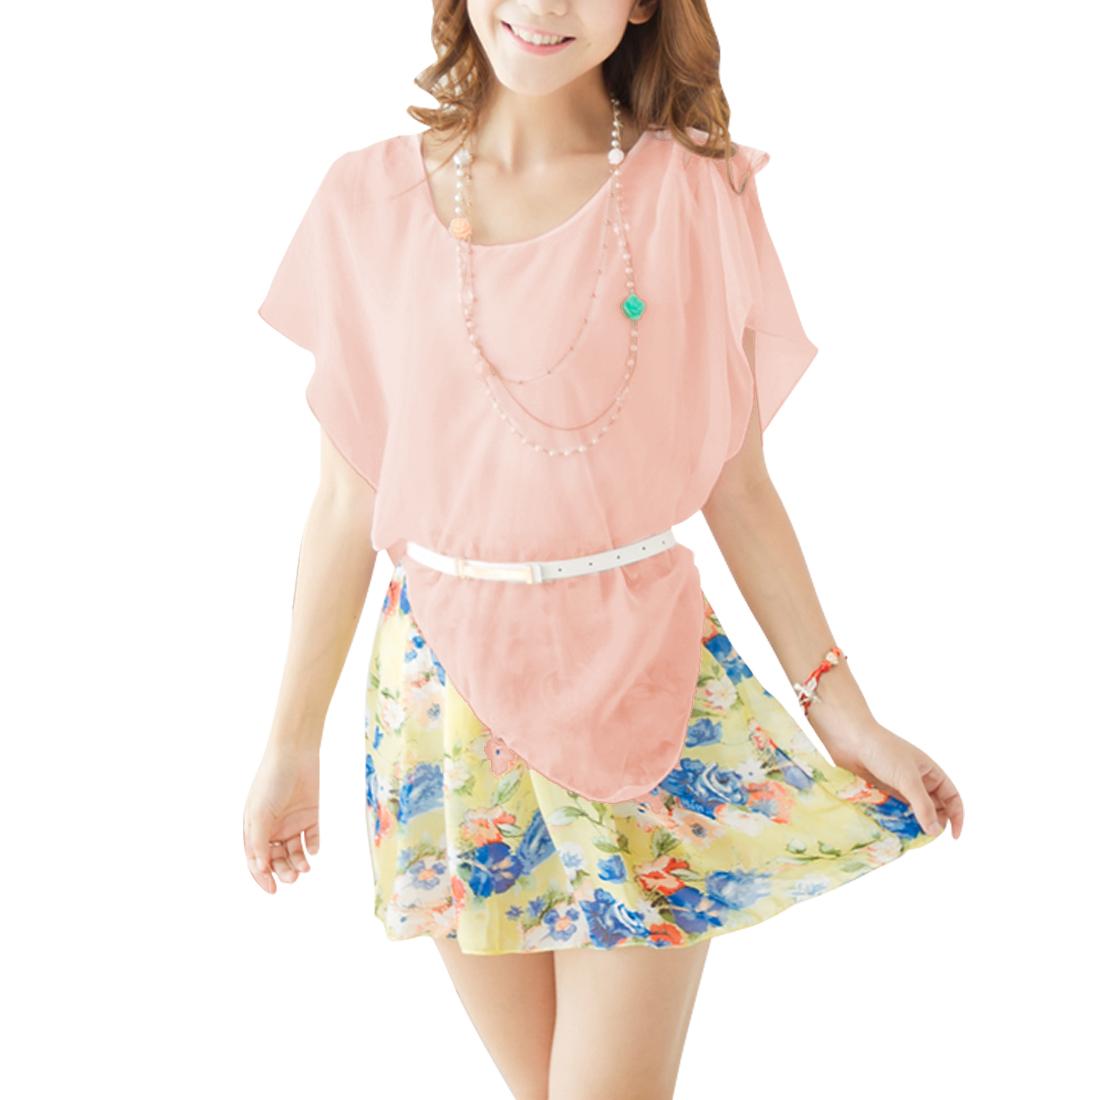 Lady Irregular Detail Design Florals Prints Light Pink Tiered Mini Dress XS